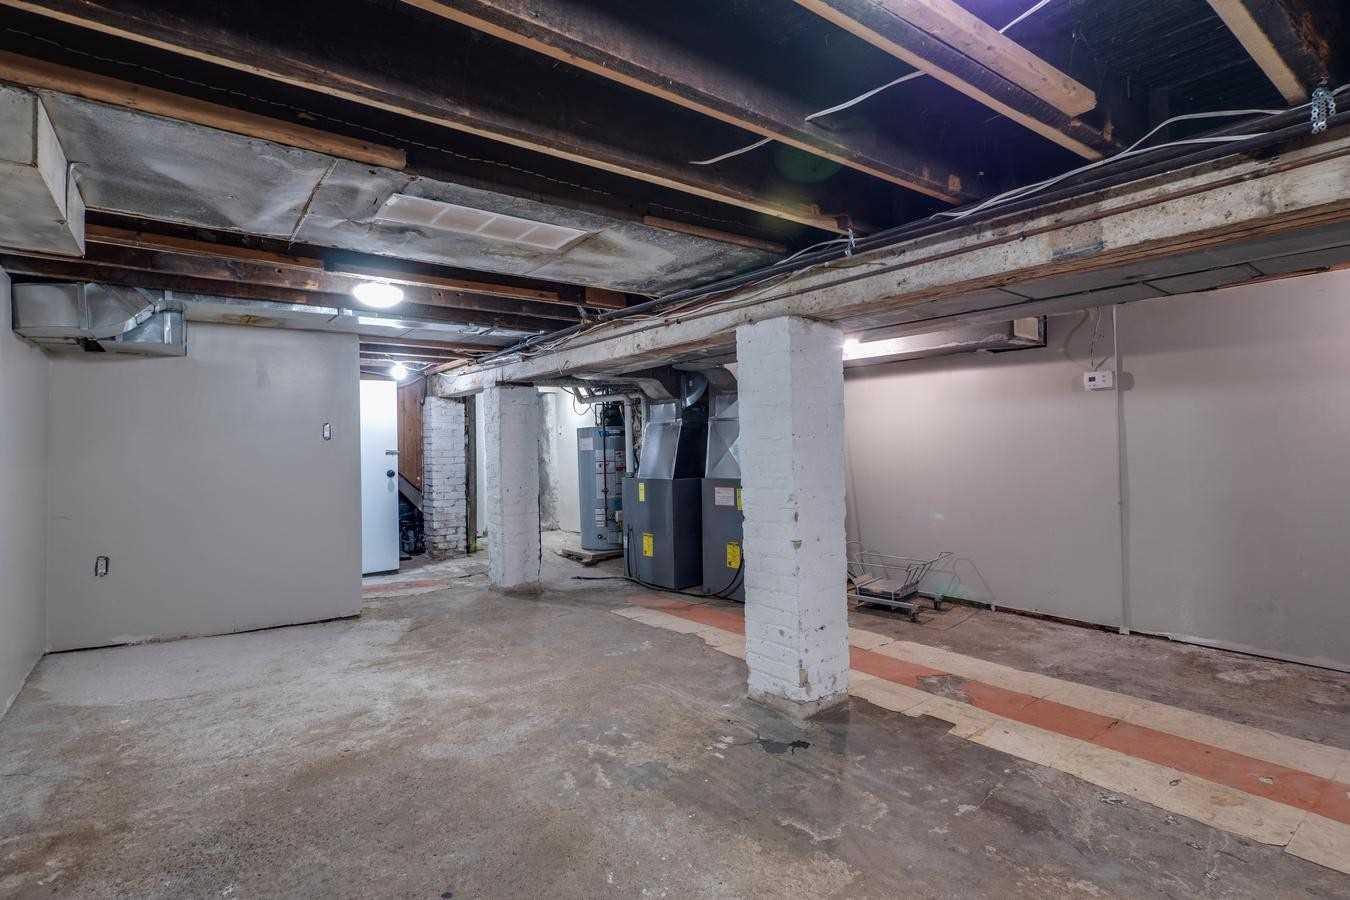 2039 Davenport Rd, Toronto, Ontario M6N1C5, 5 Bedrooms Bedrooms, 11 Rooms Rooms,5 BathroomsBathrooms,Semi-detached,For Sale,Davenport,W5055760